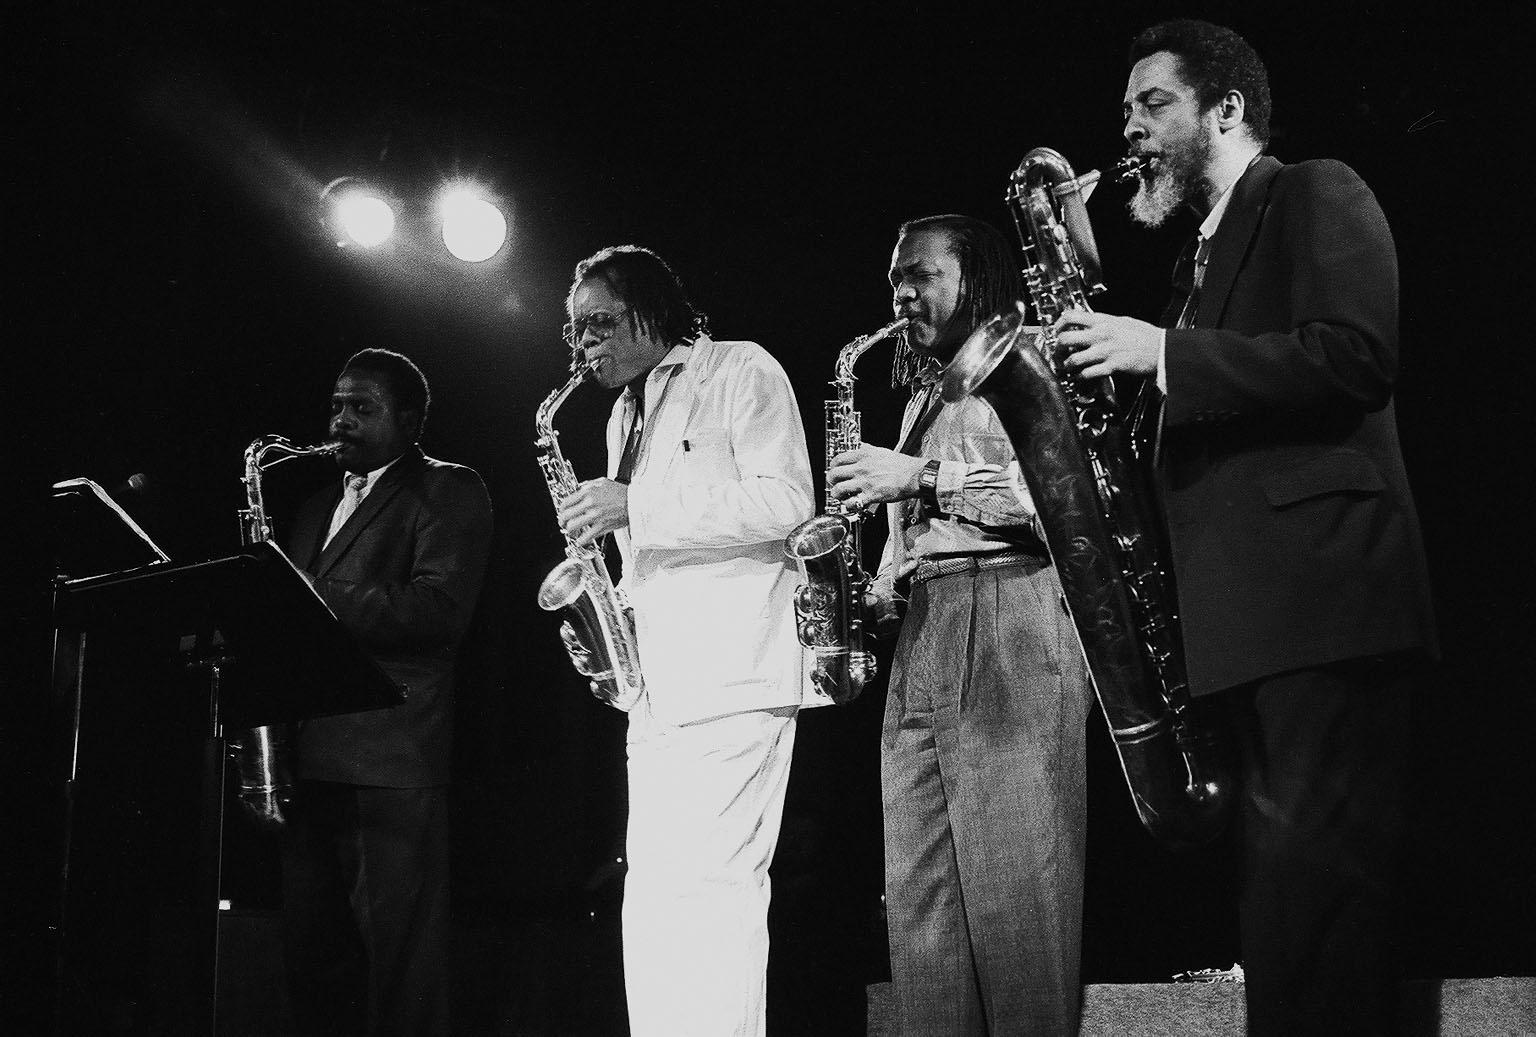 The World Saxophone Quartet